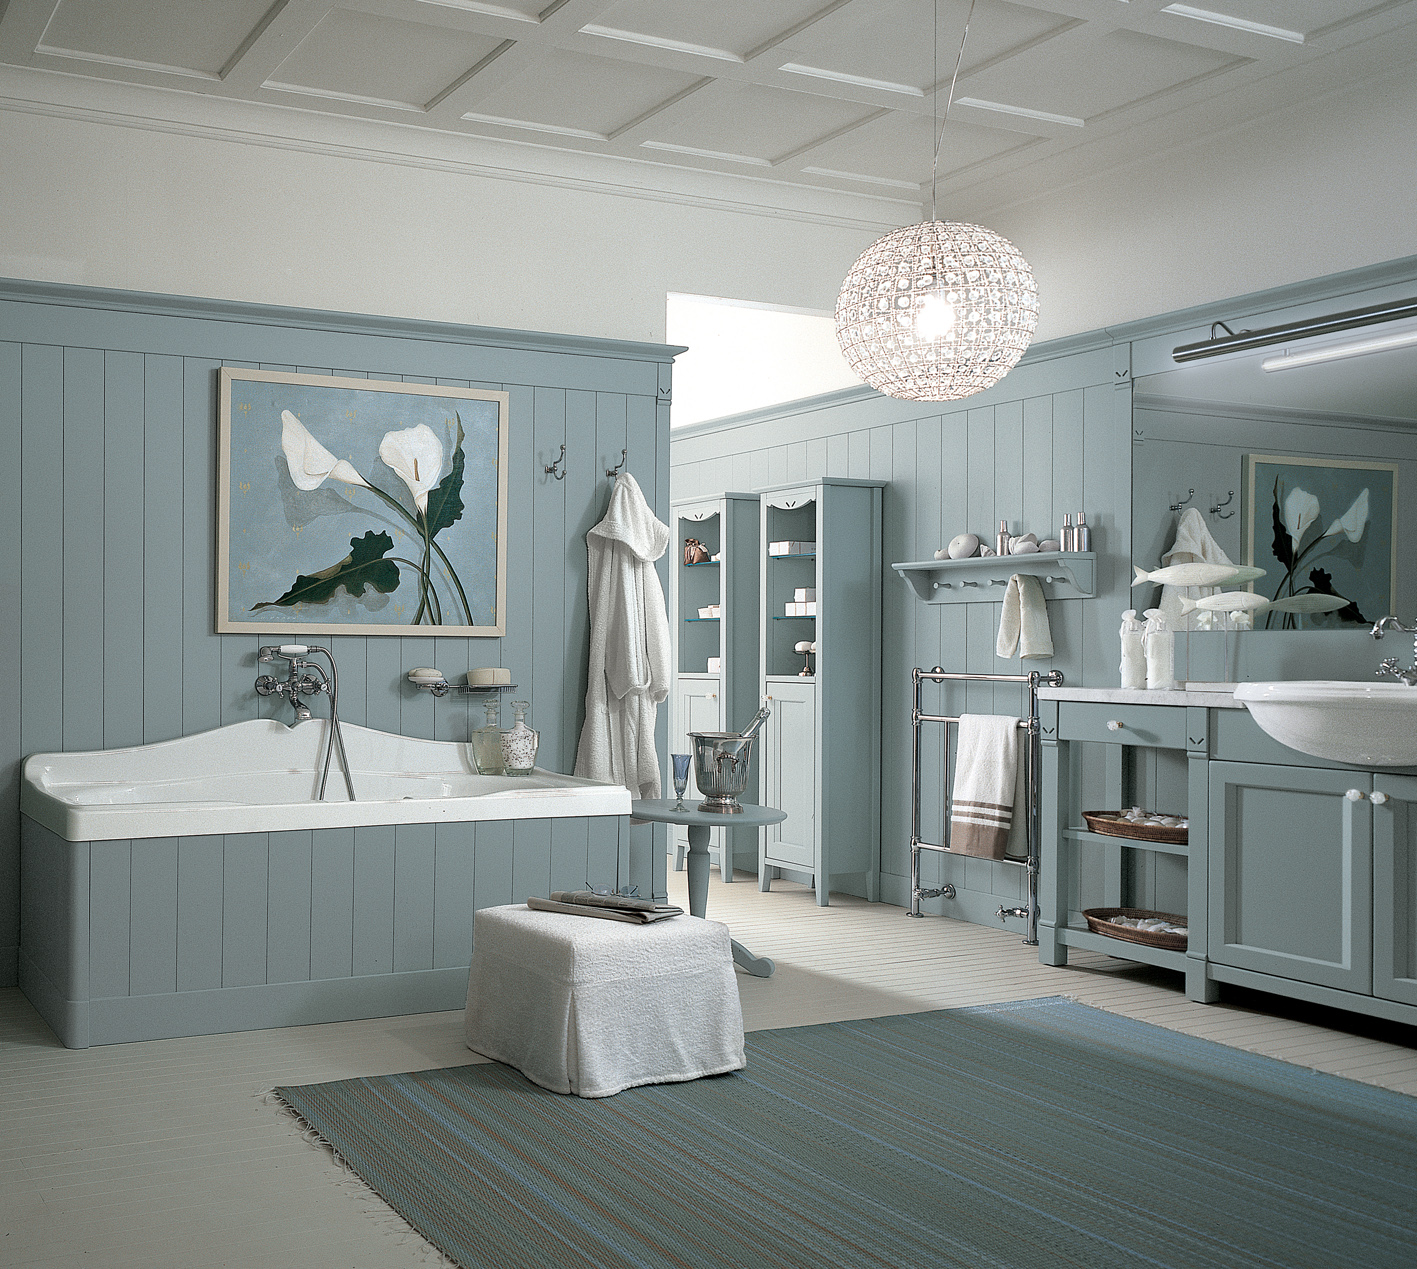 English Mood - bathroom by Minacciolo - The Kitchen and Bathroom Blog